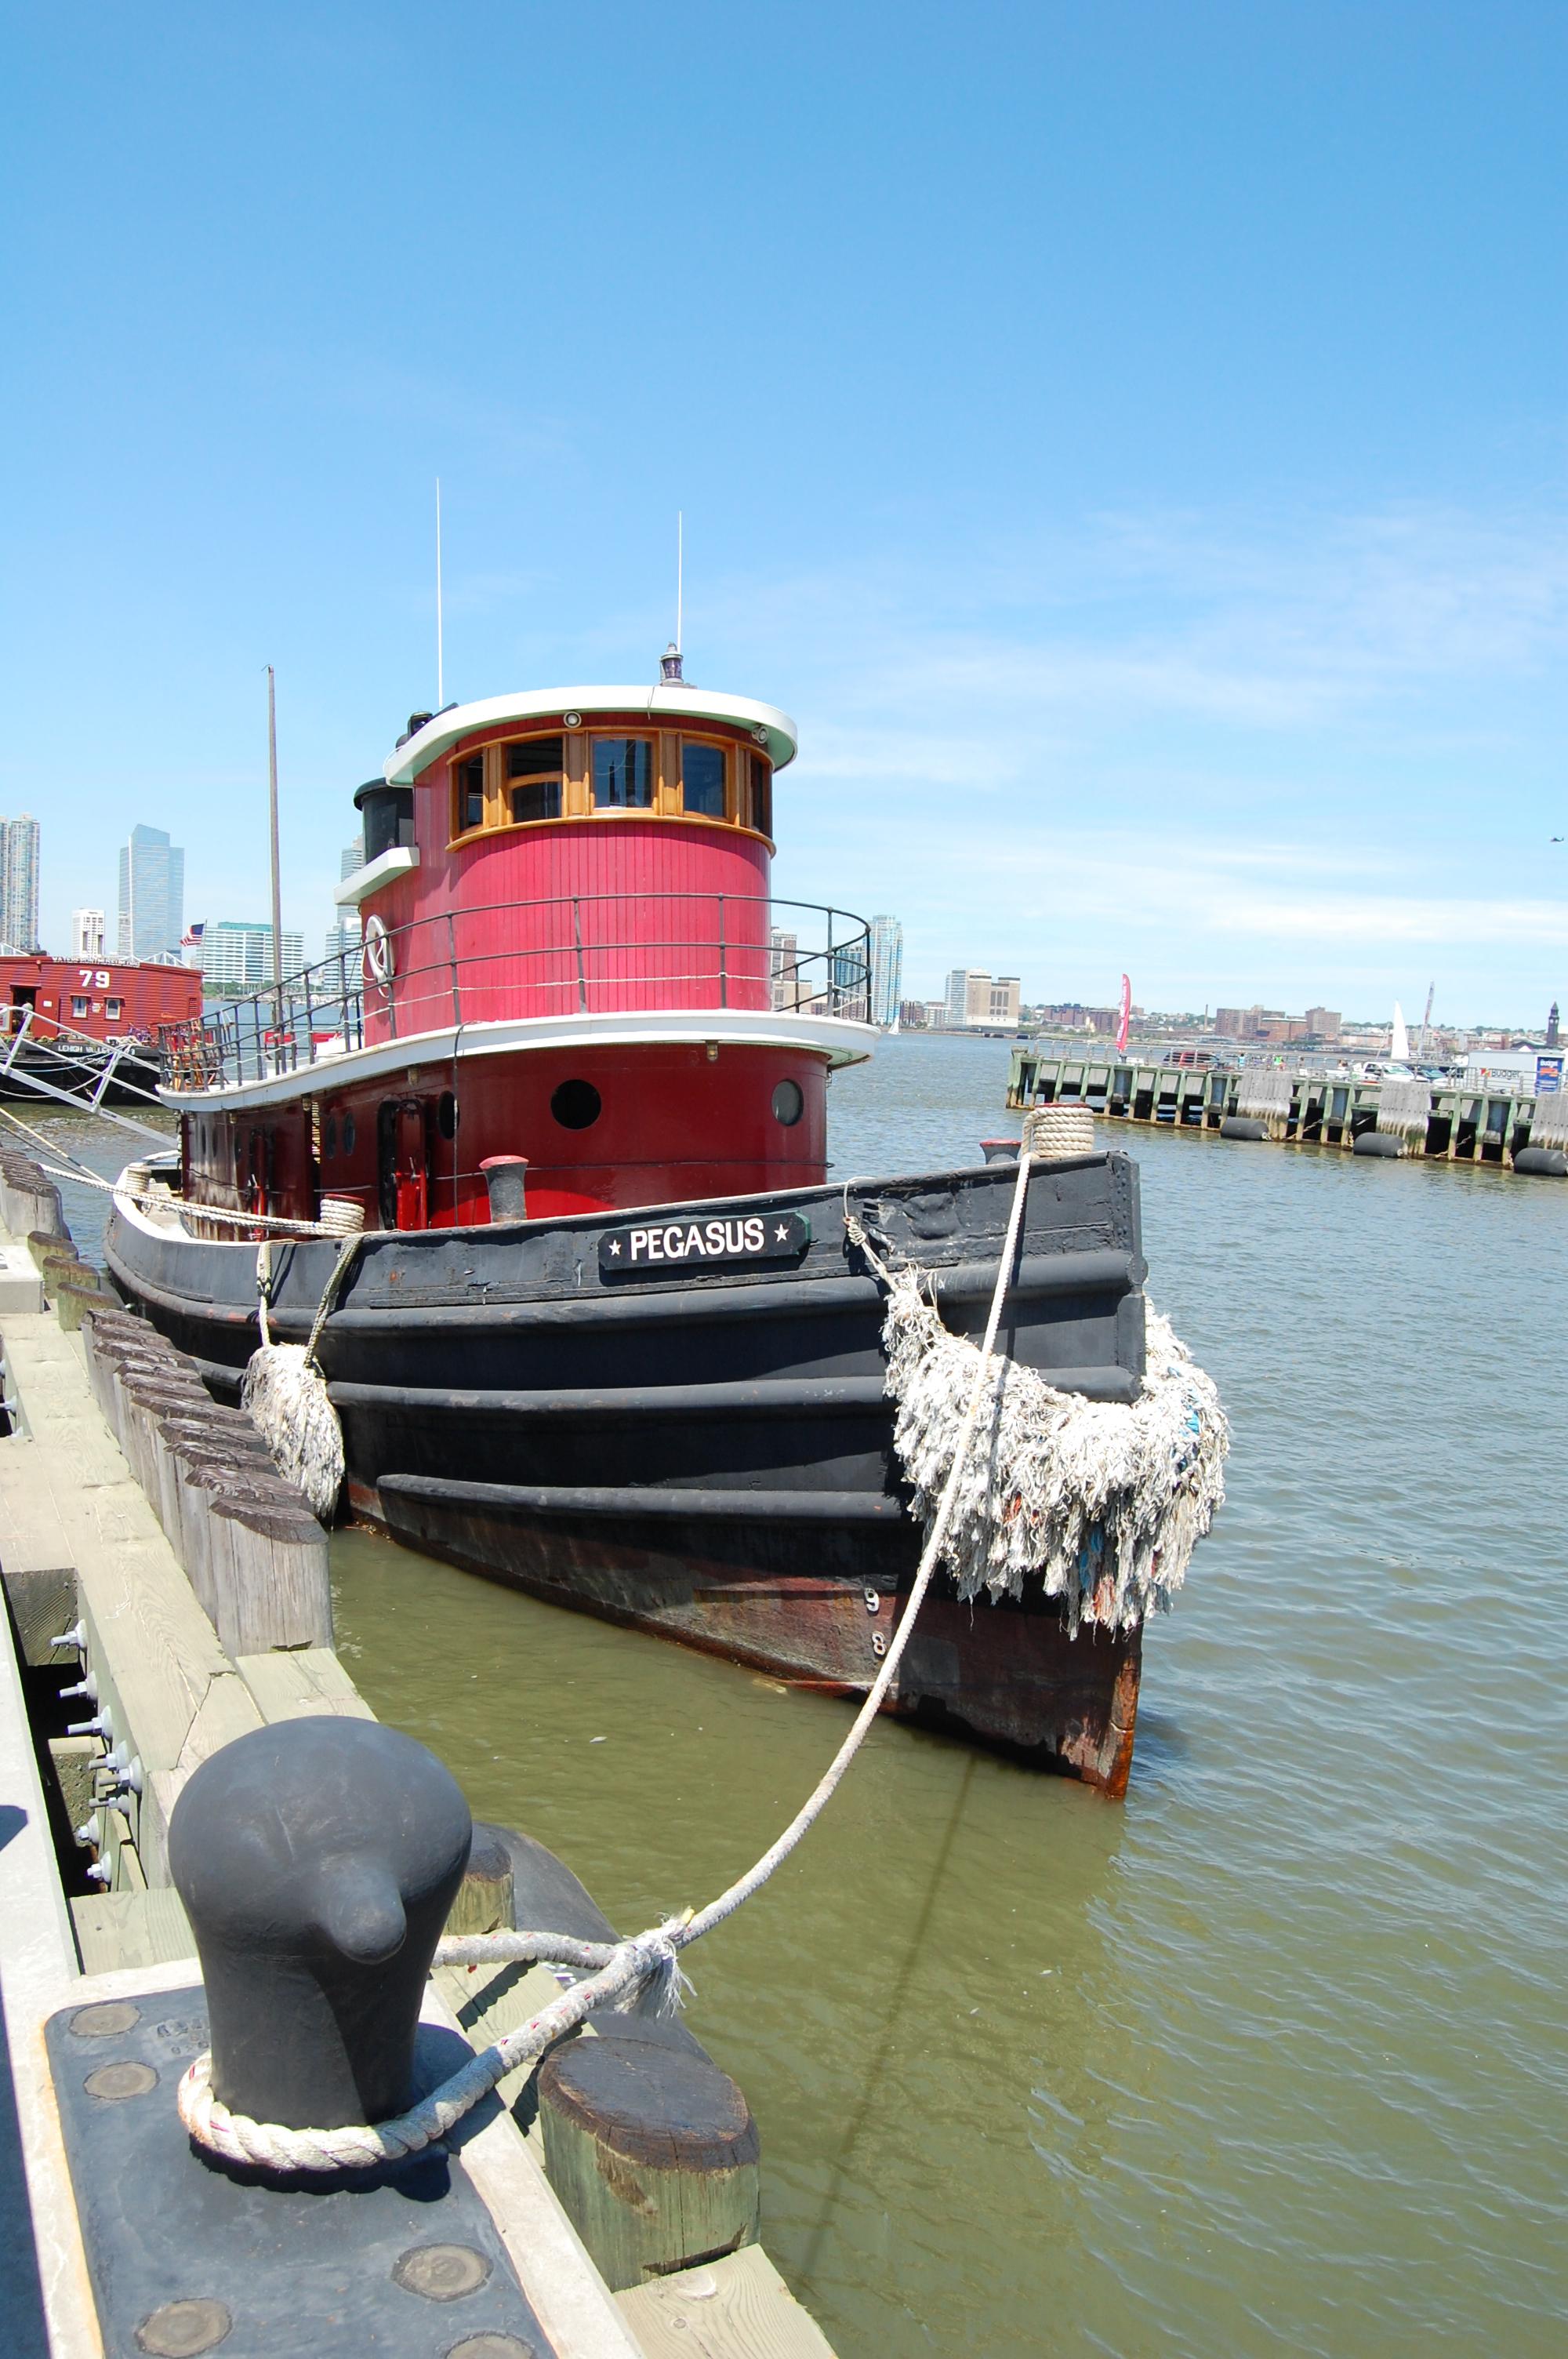 Tugboat Pegasus at Dock, 2014, Photo by Paul Demonte